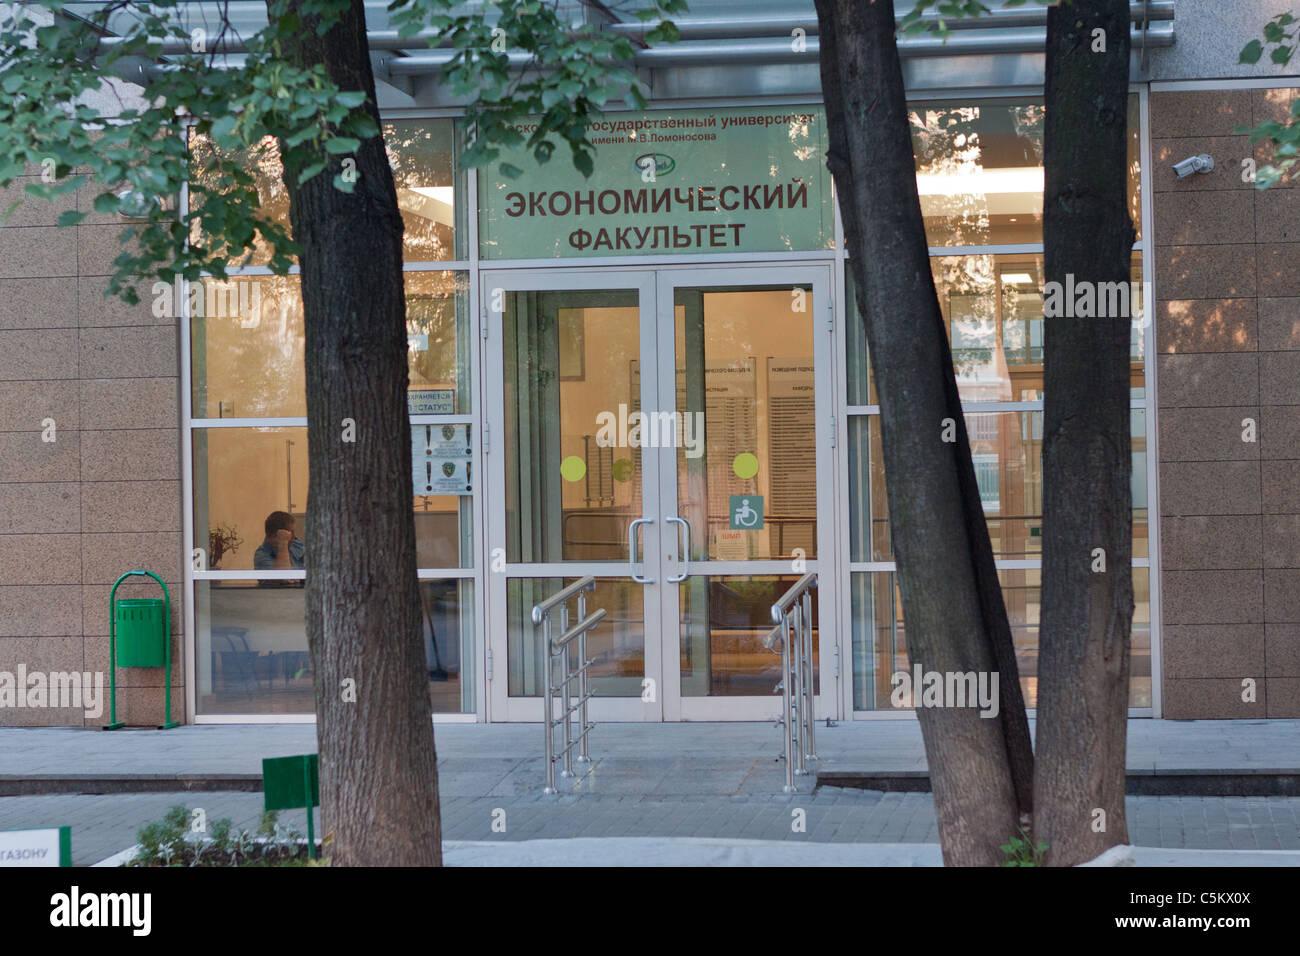 Faculty of Economics, Lomonosov